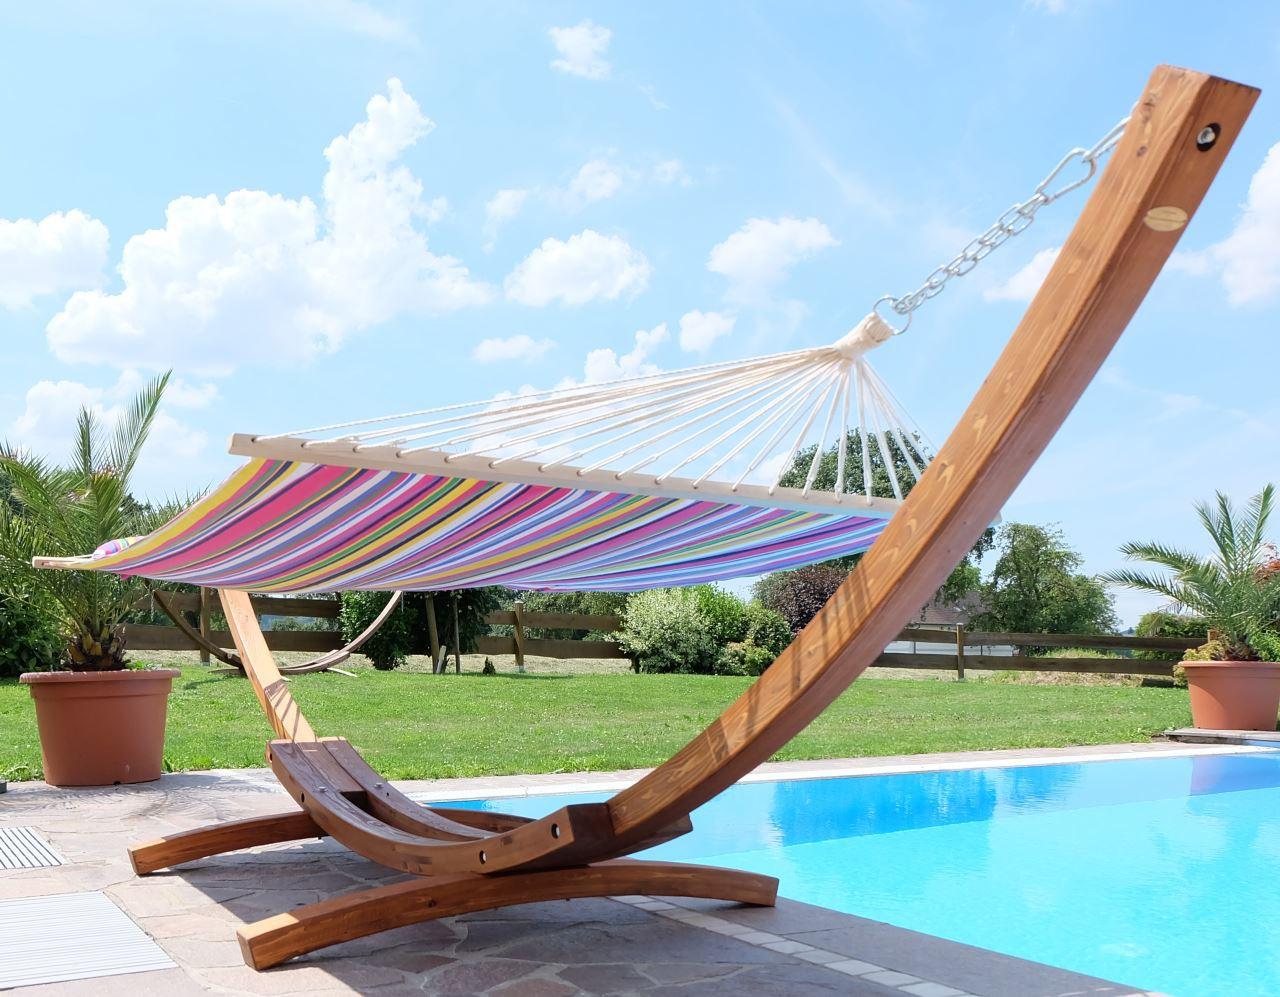 410cm xxl luxus h ngemattengestell aus holz l rche mit h ngematte limited edition edelstahl. Black Bedroom Furniture Sets. Home Design Ideas